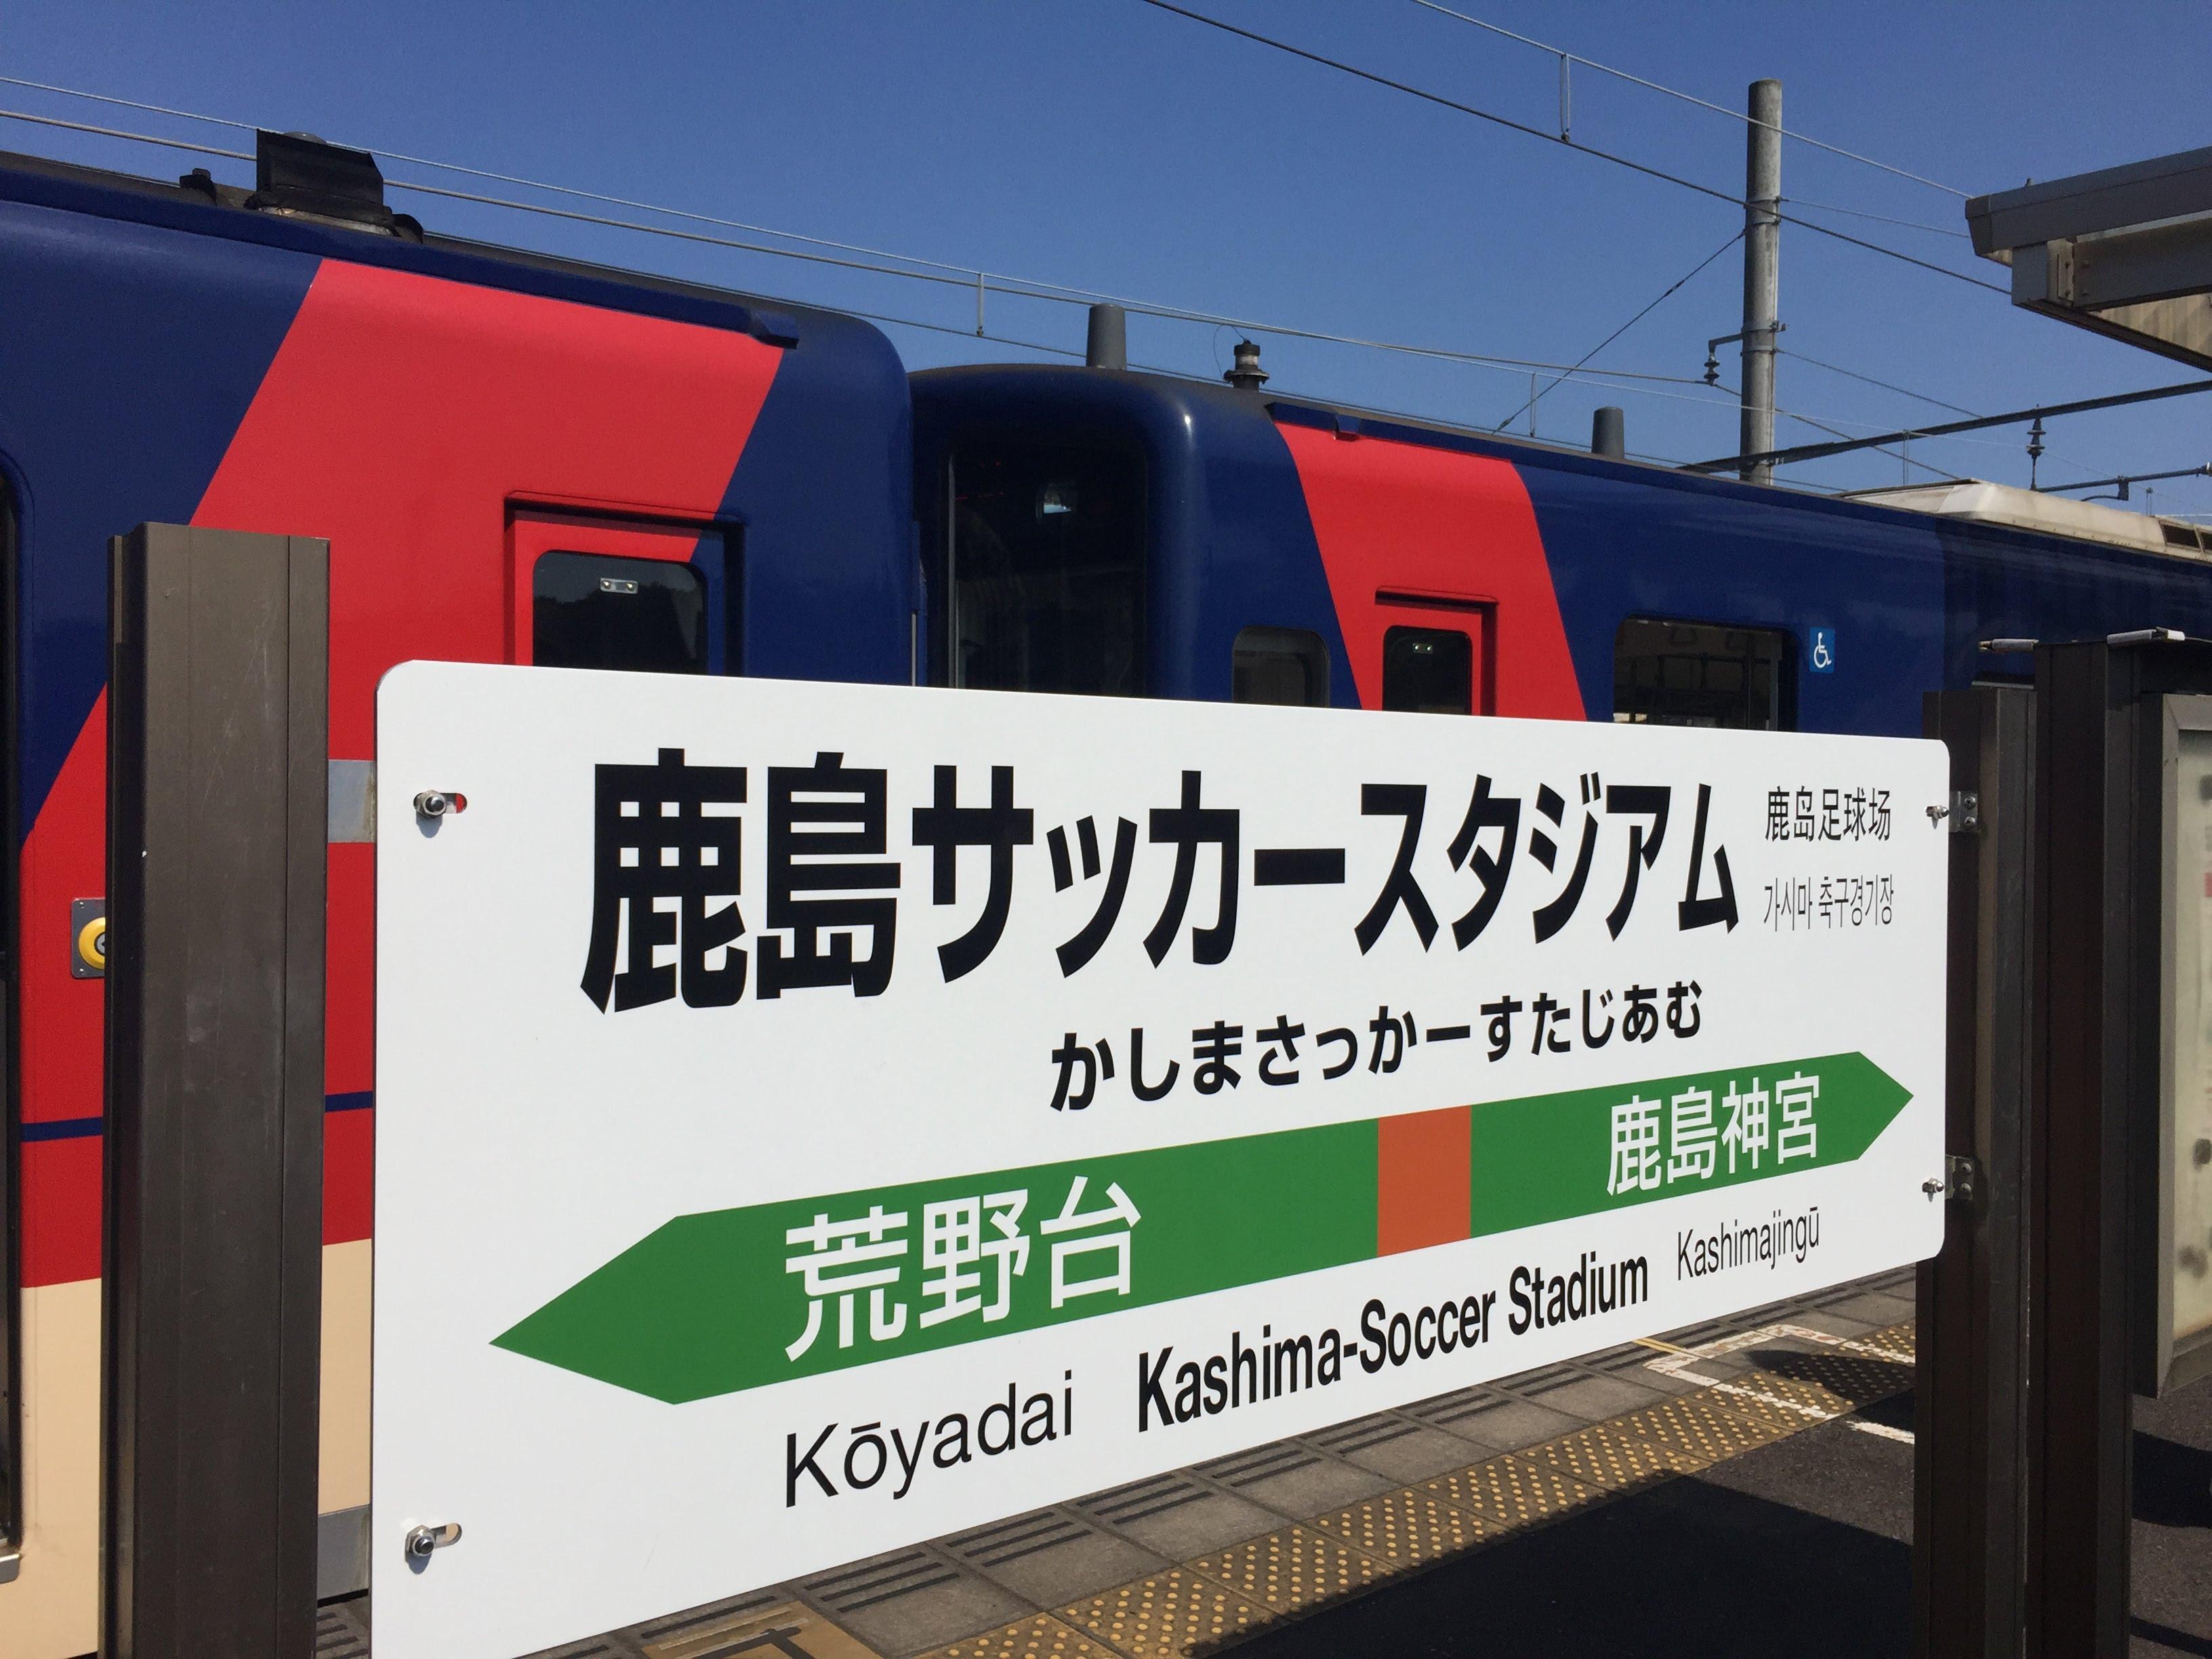 https://soccerkansen-torisetsu.com/wp-content/uploads/2018/06/IMG_5342.jpg